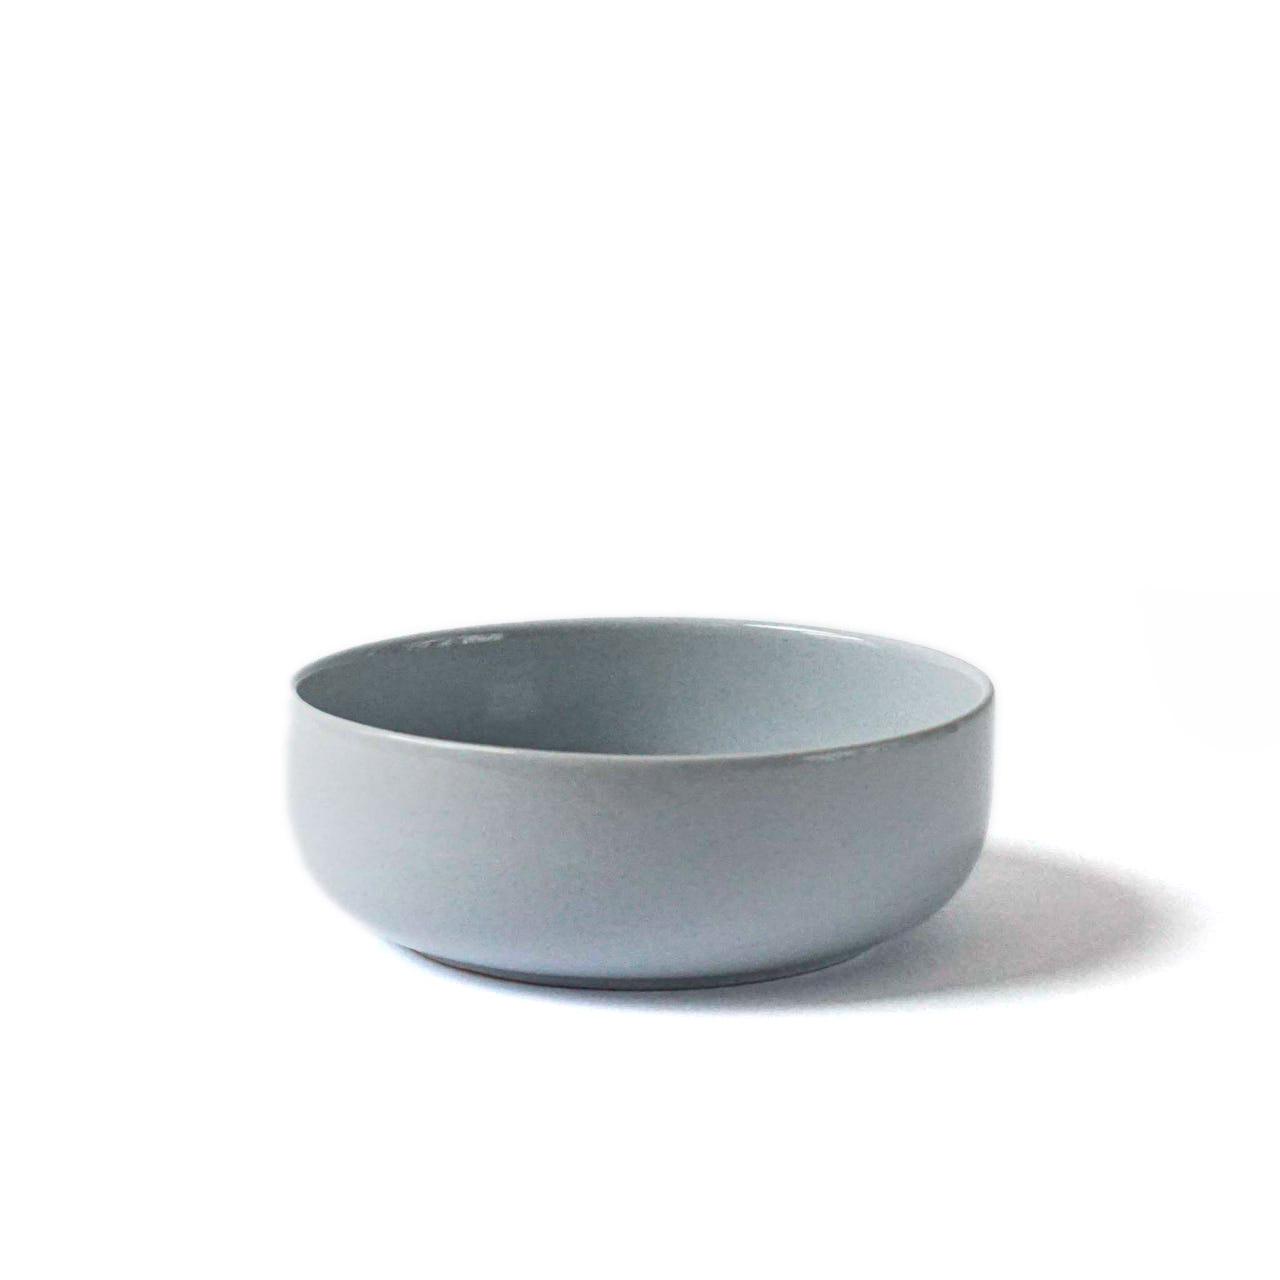 Indre Ceramics Artic Grey Schale 16cm